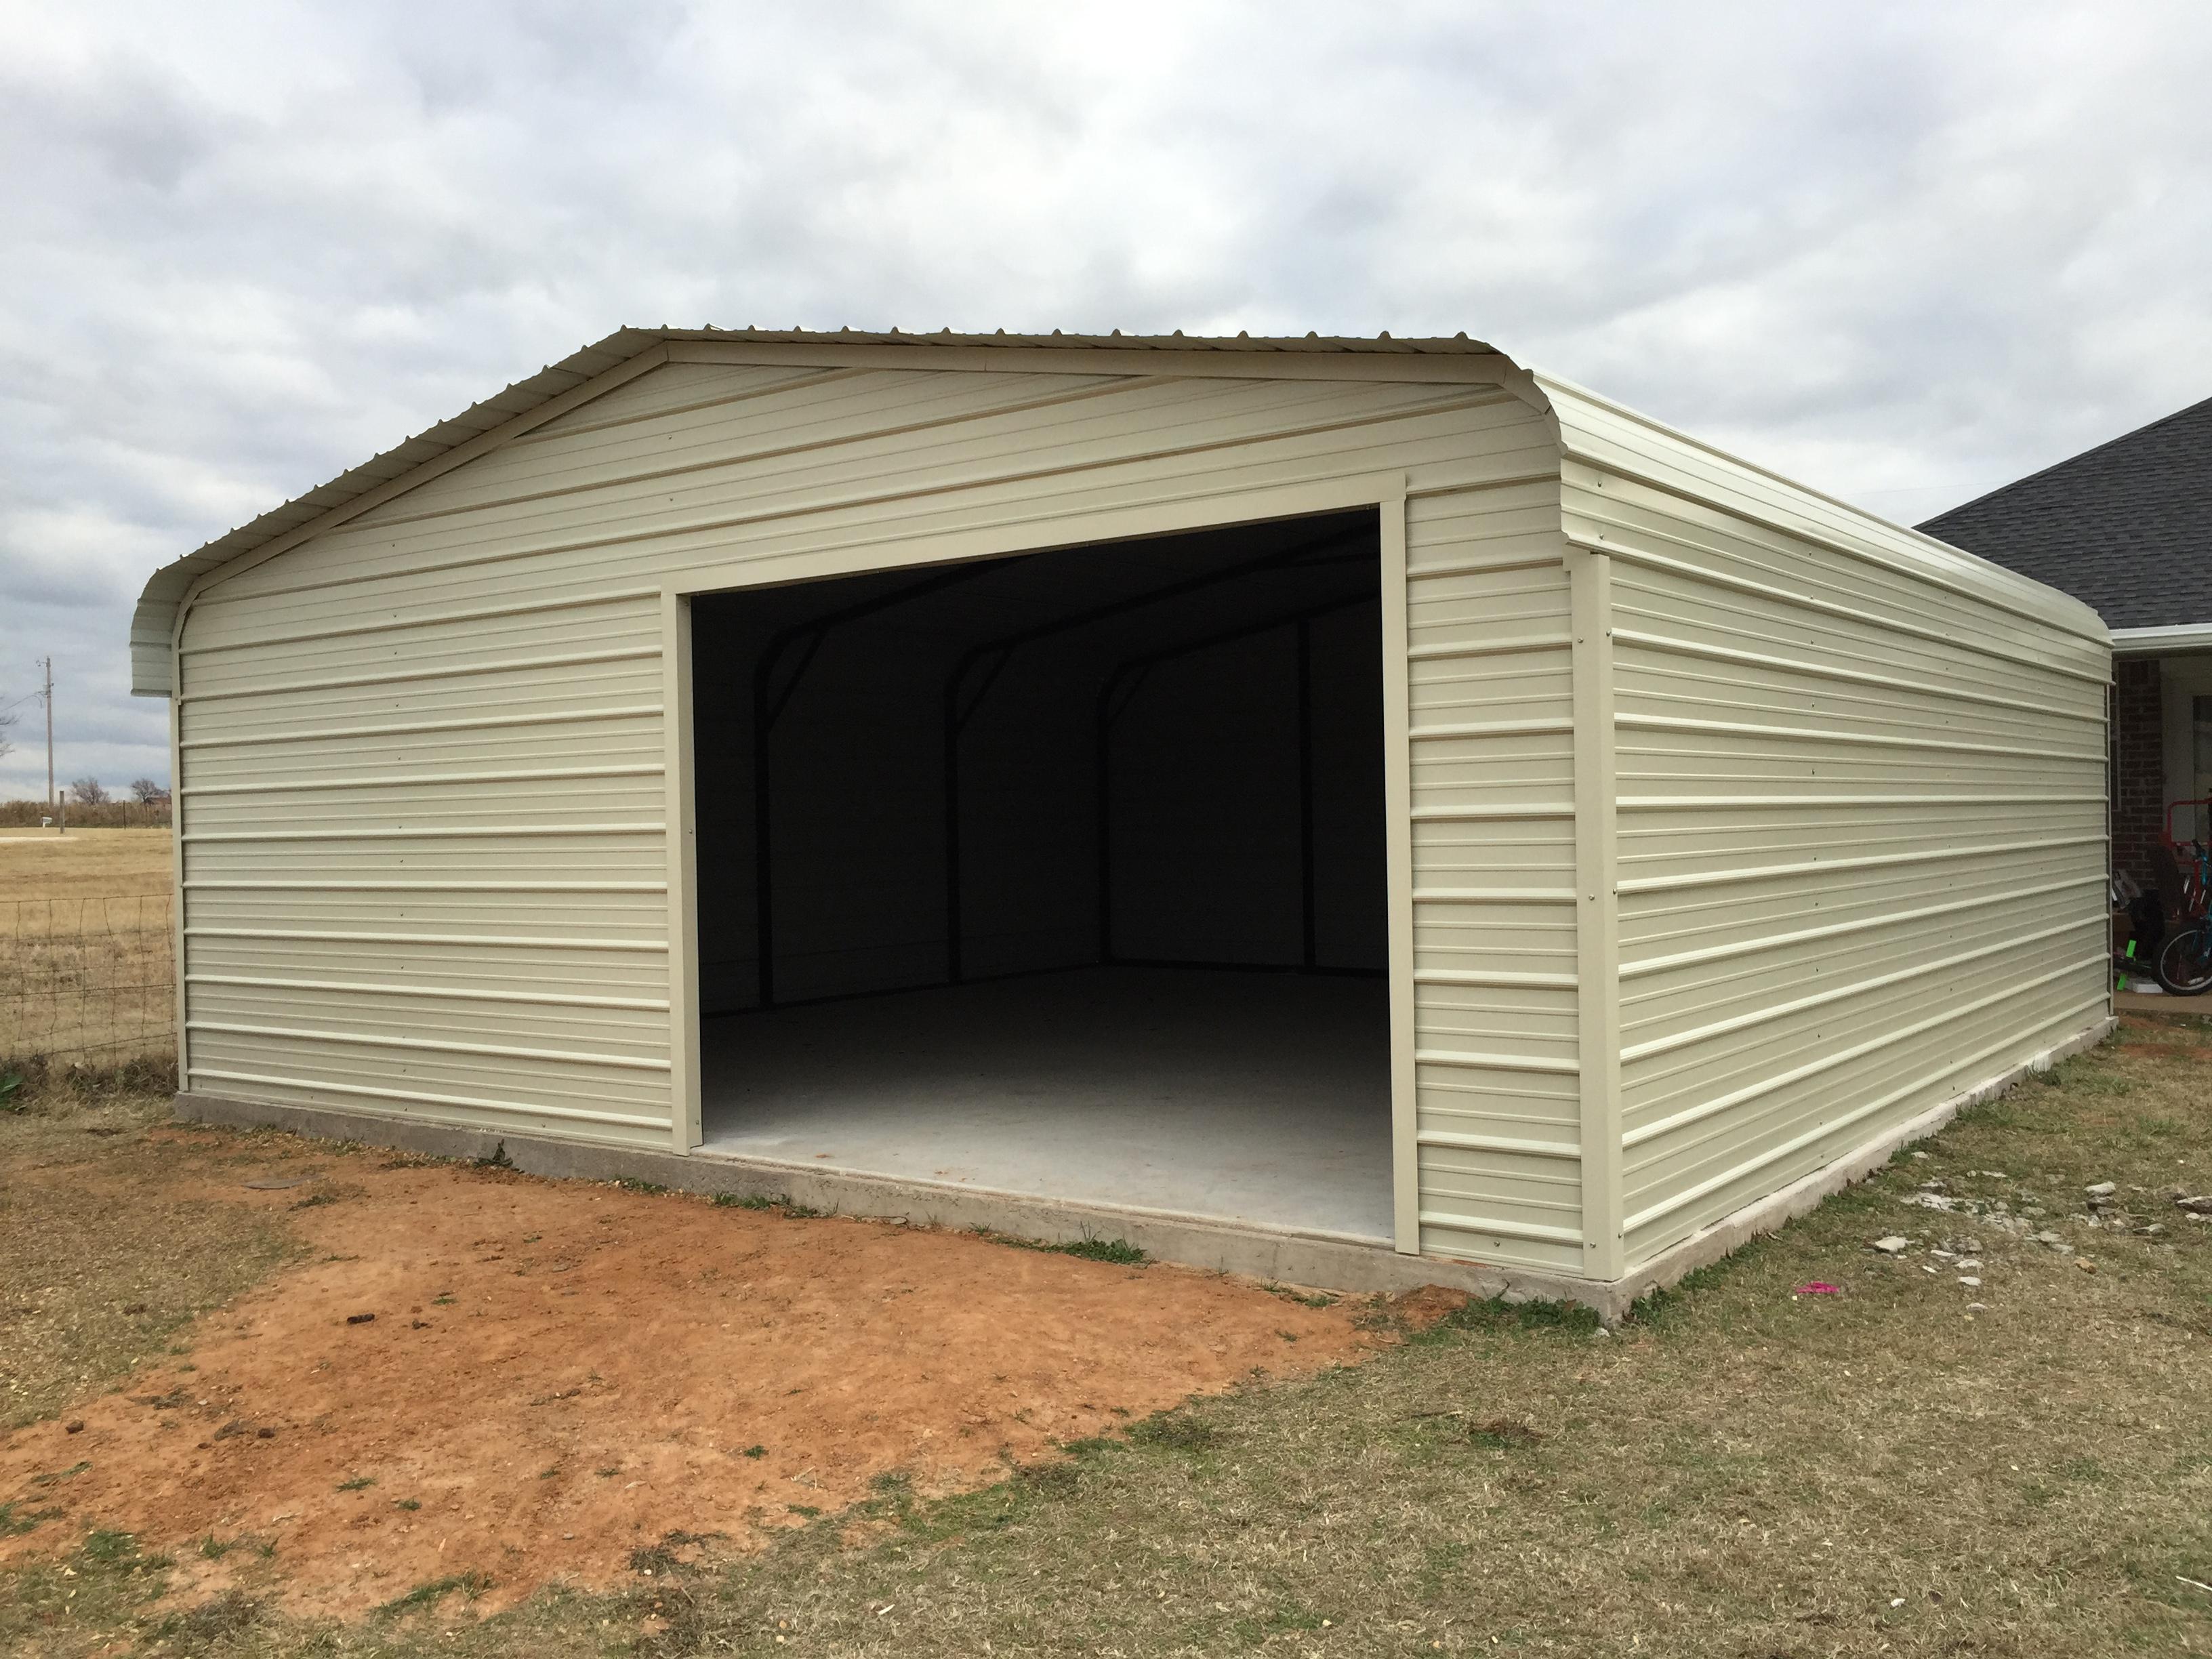 18x20 Metal Garage : Standard garages